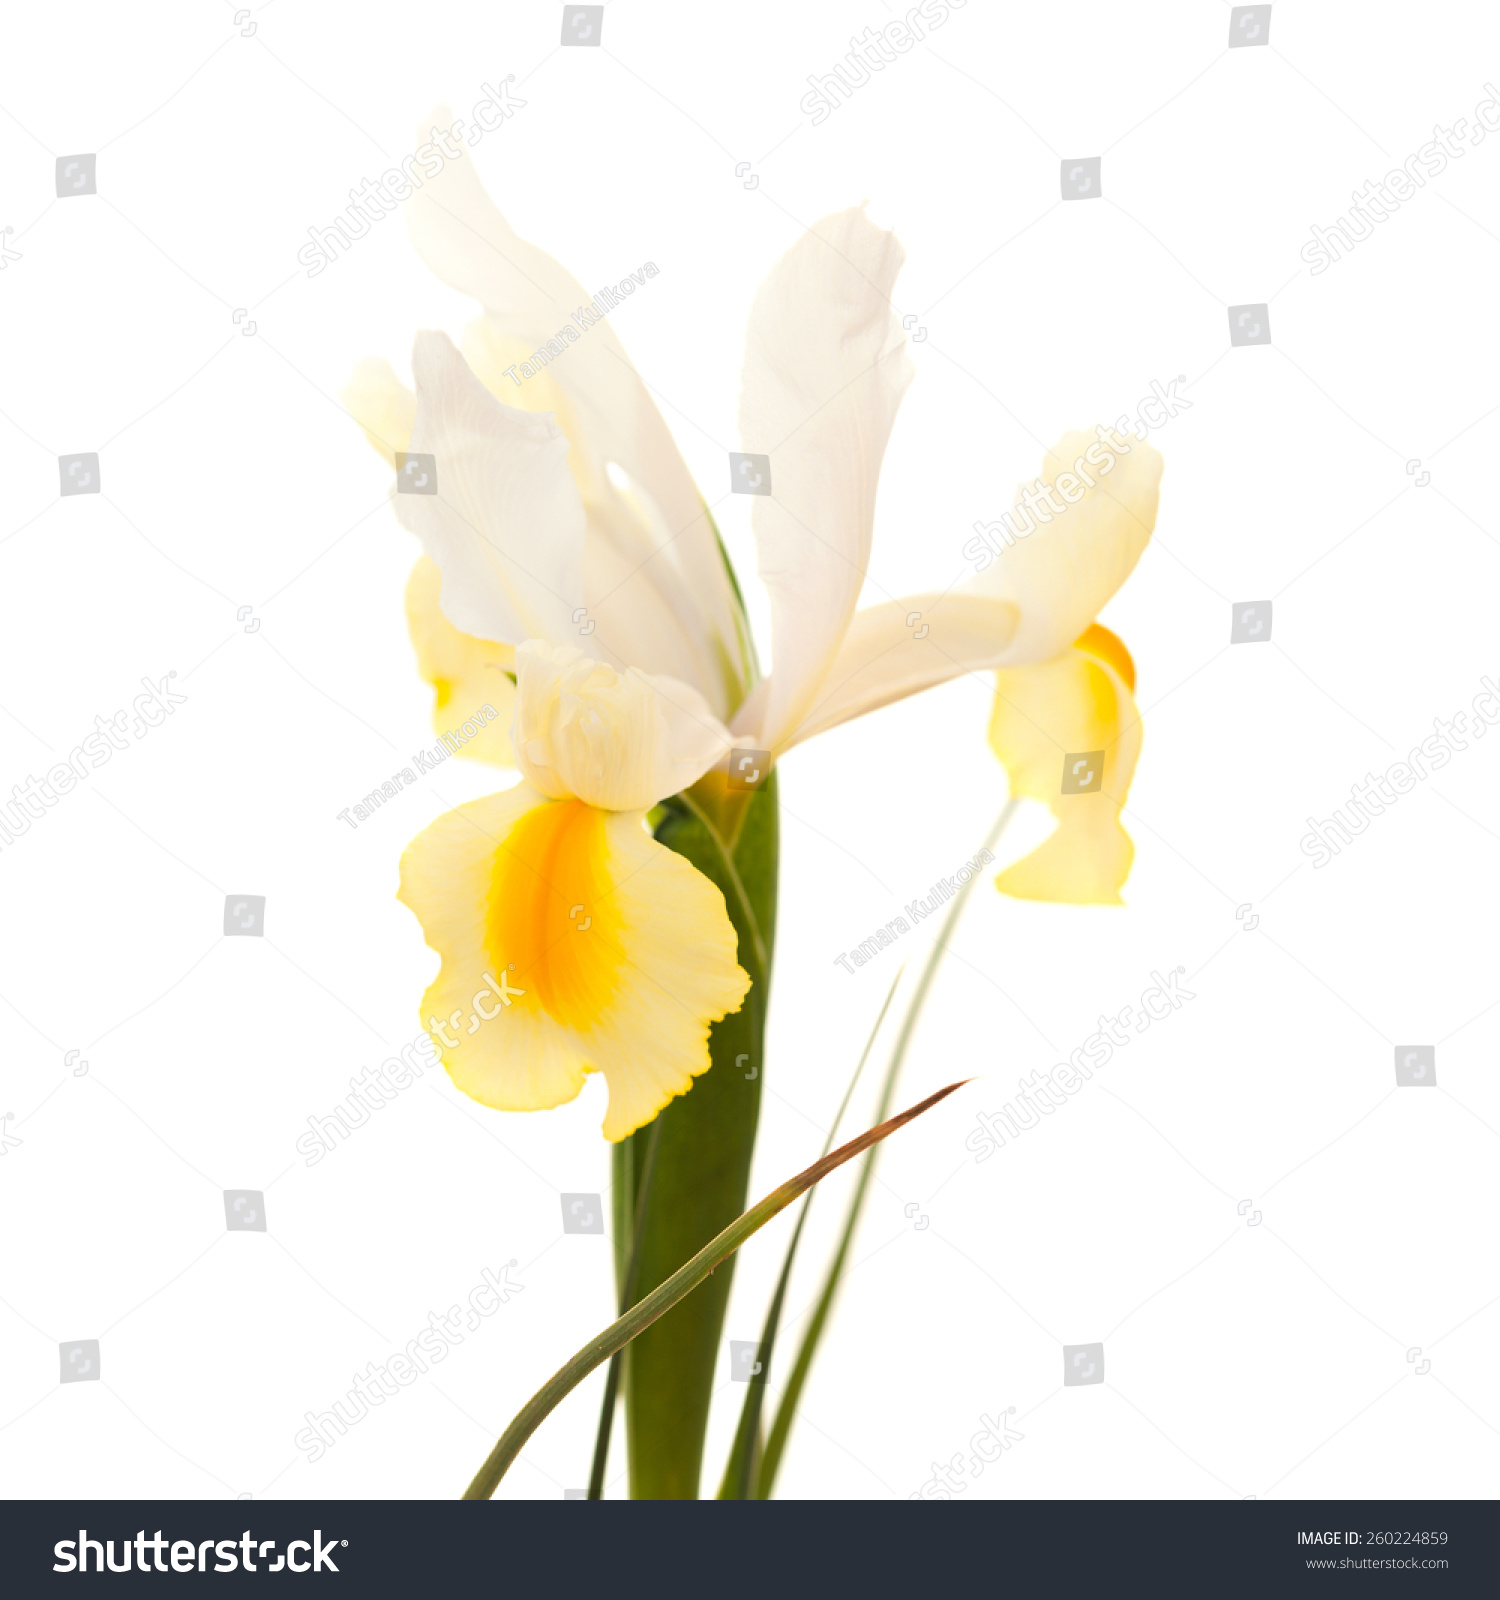 Yellow White Iris Flower Isolated On Stock Photo 260224859